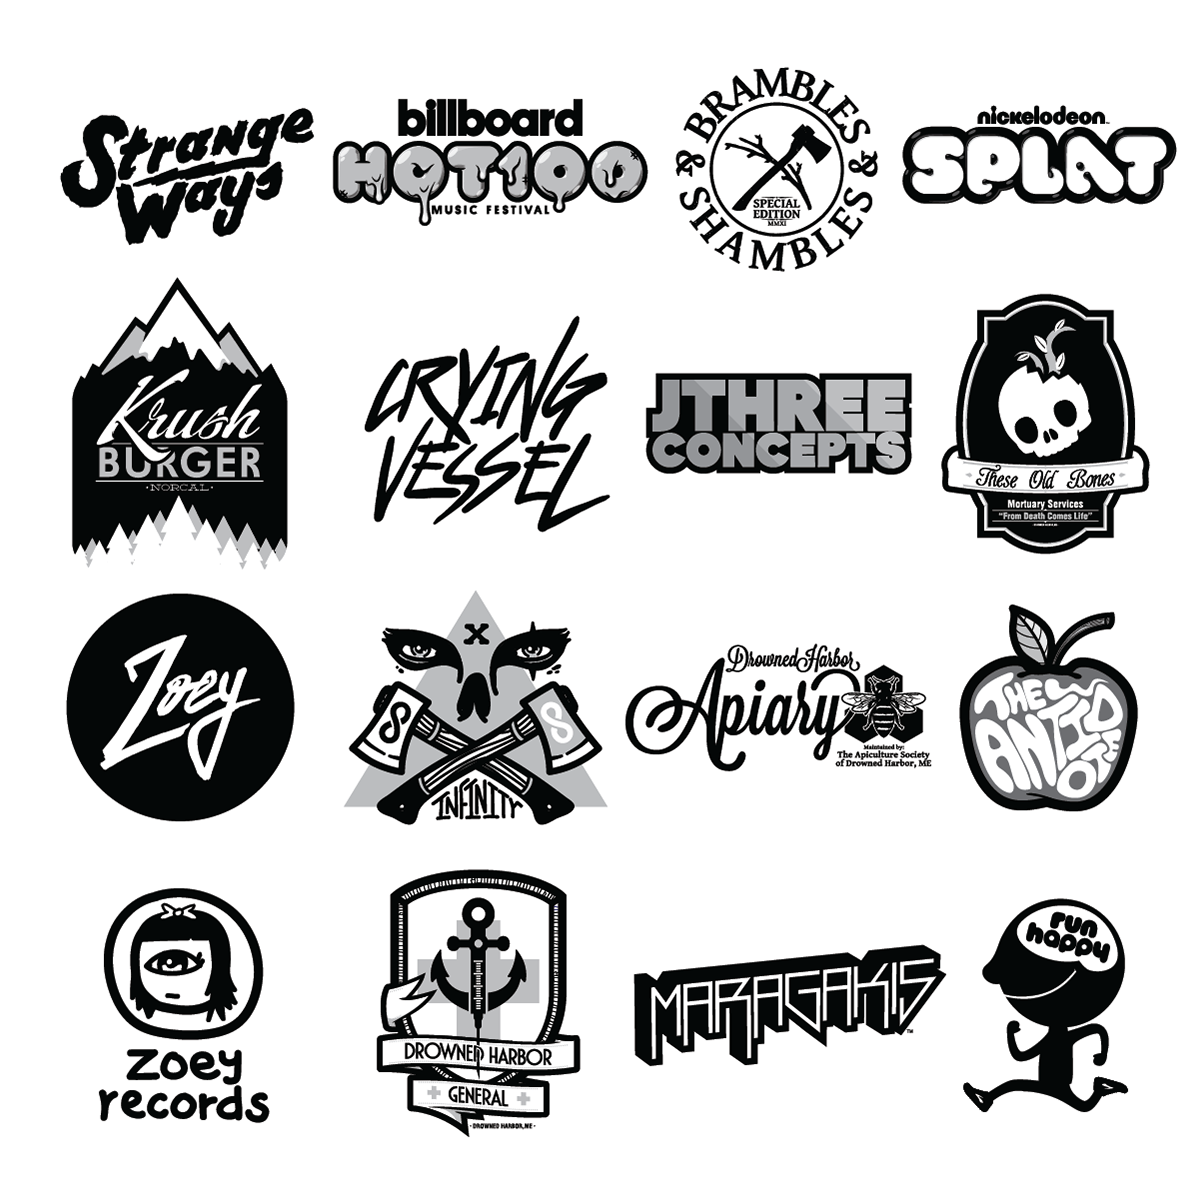 logo design vector nickelodeon krush burger Blood Sweat crying vessel ubisoft Zoey dead astronauts billboard hot 100 jthree concepts